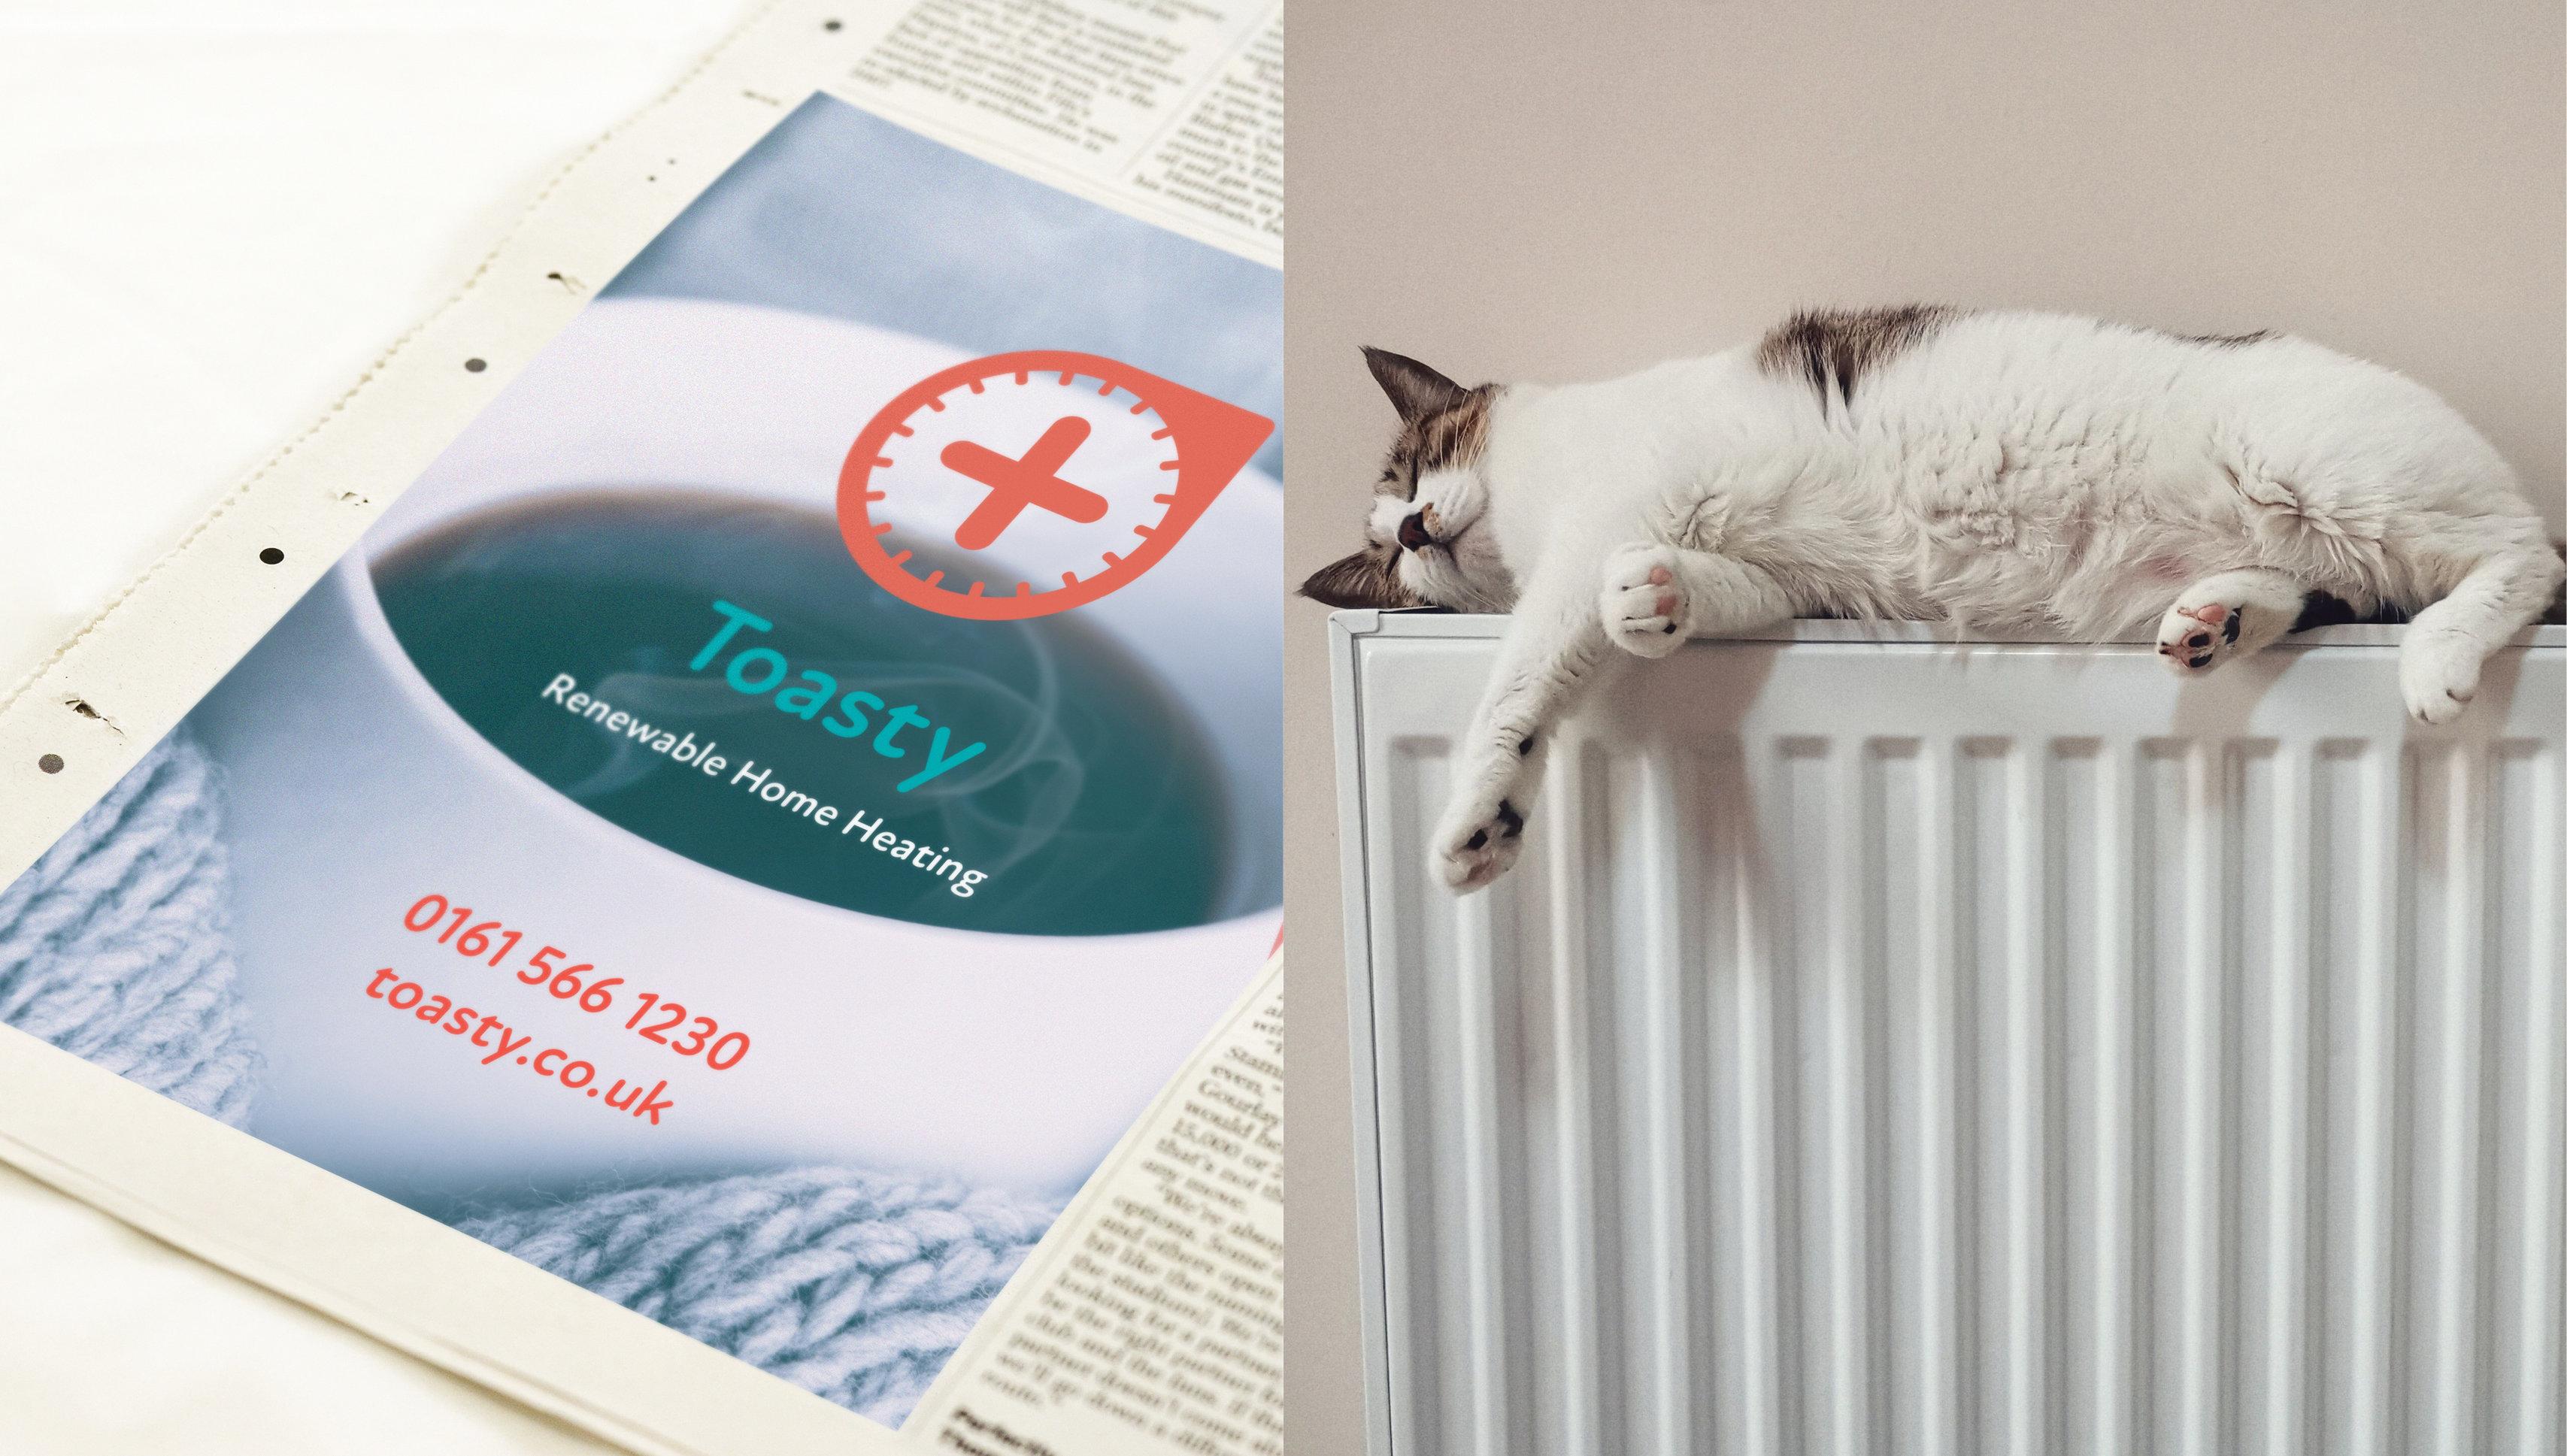 branding and logo design for renewable energy home heating supplier